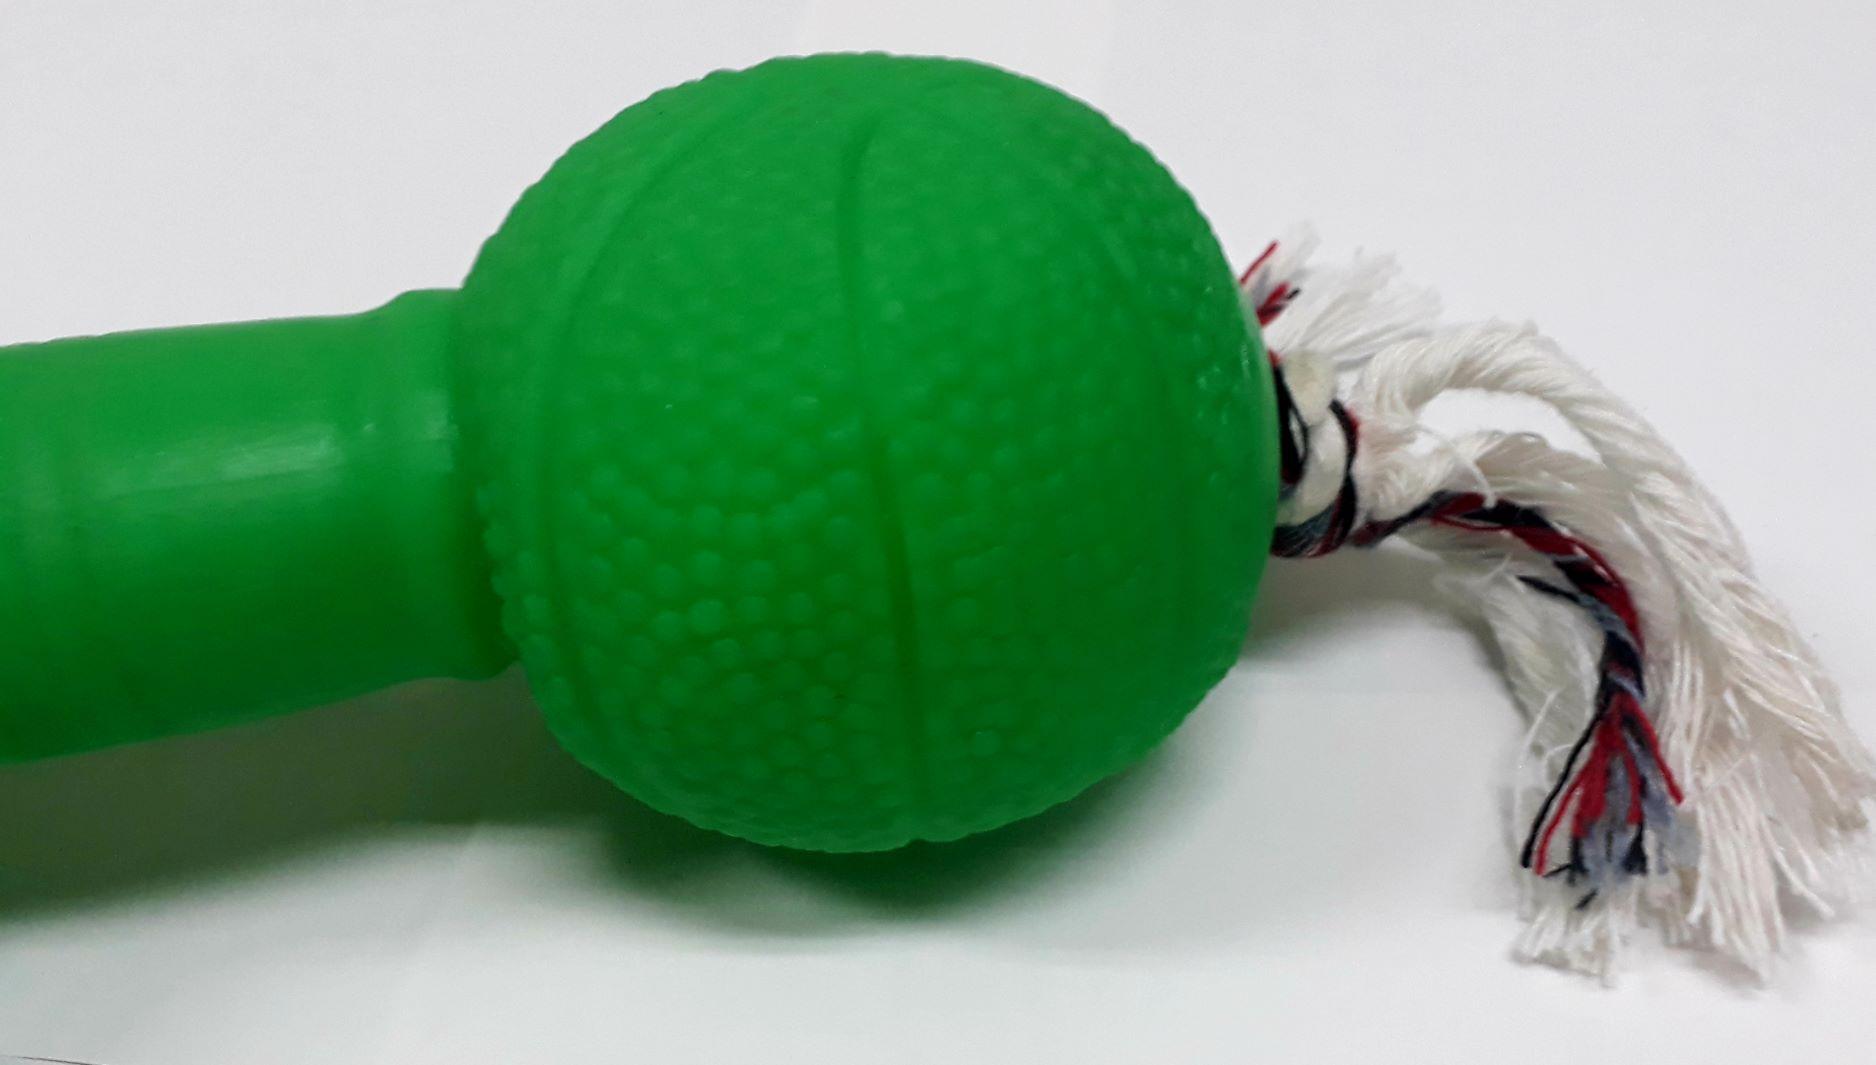 Brinquedo Halteres Grande com crivo Plastico Verde